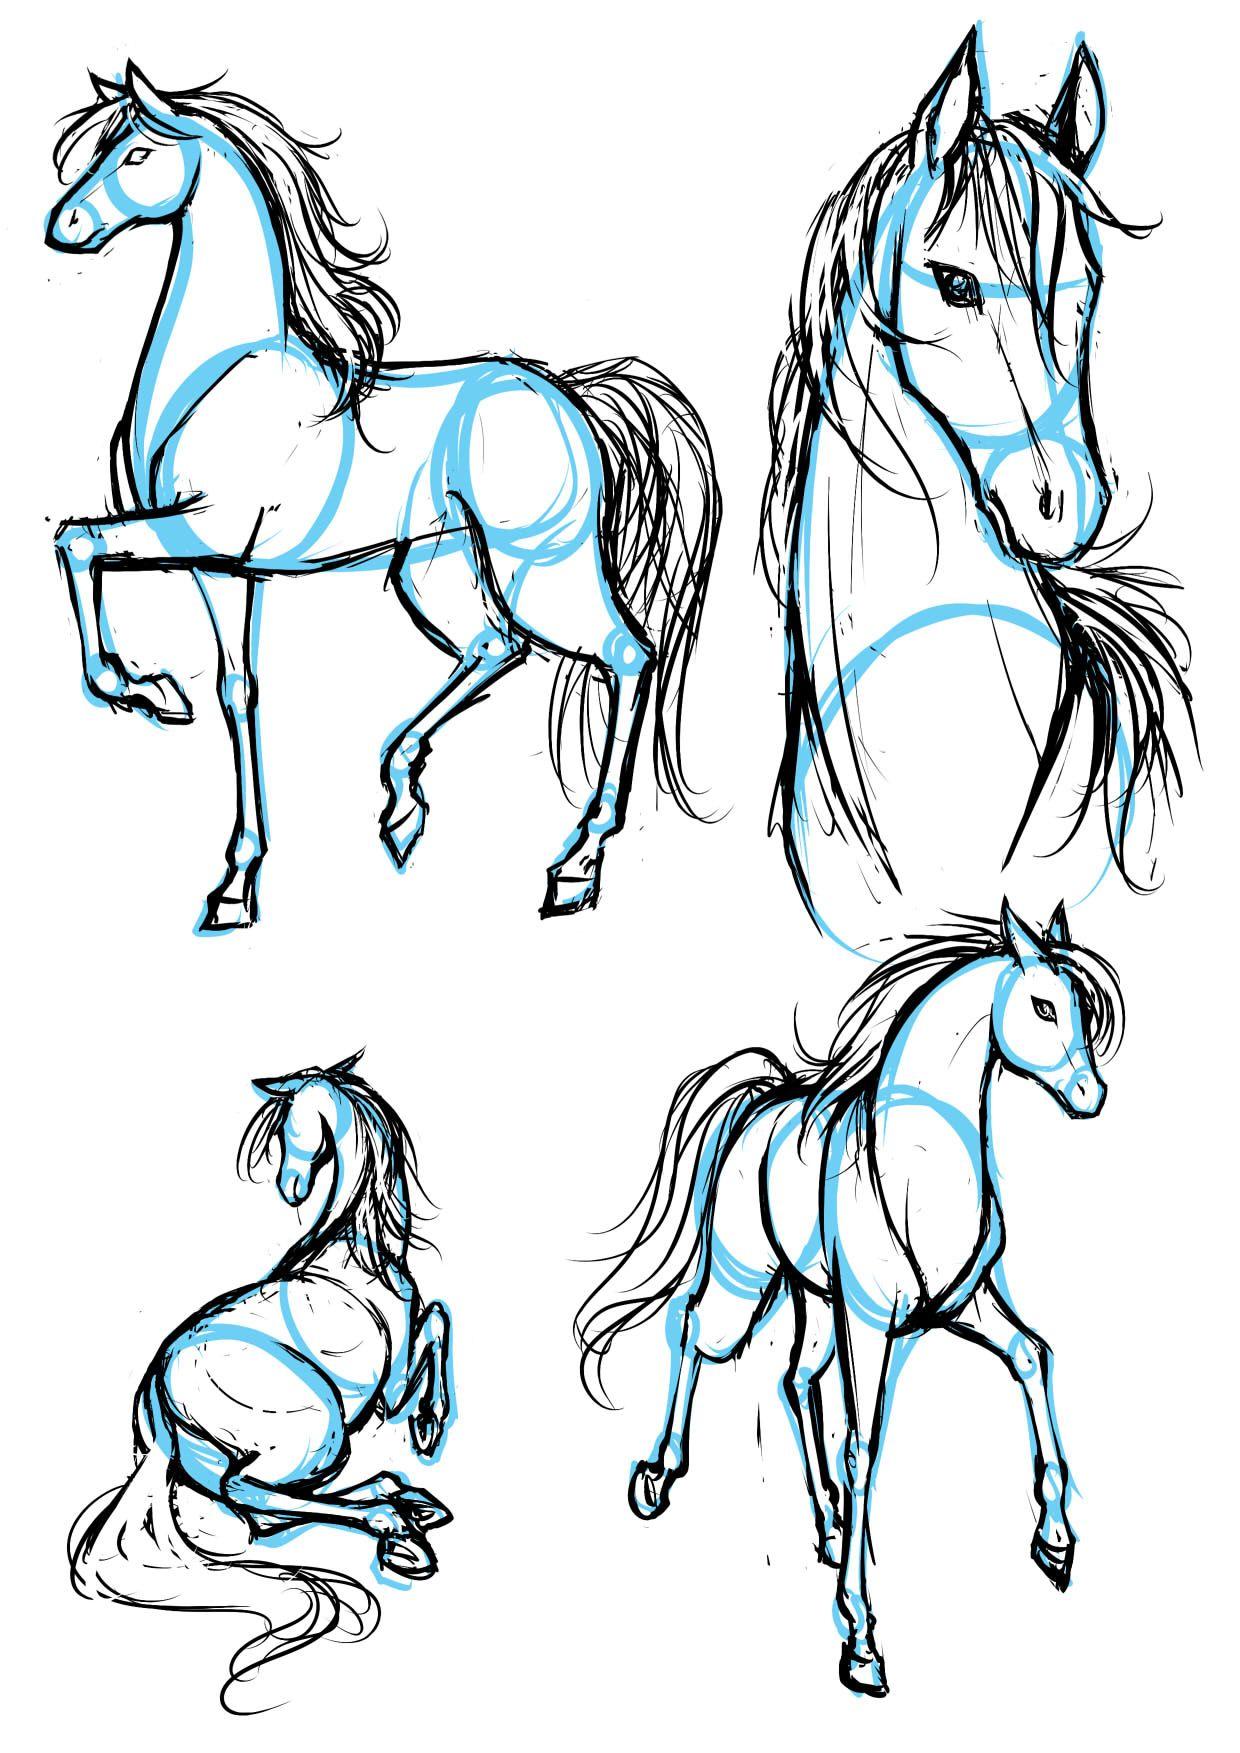 1240x1753 Gallery How To Draw Manga Animals,